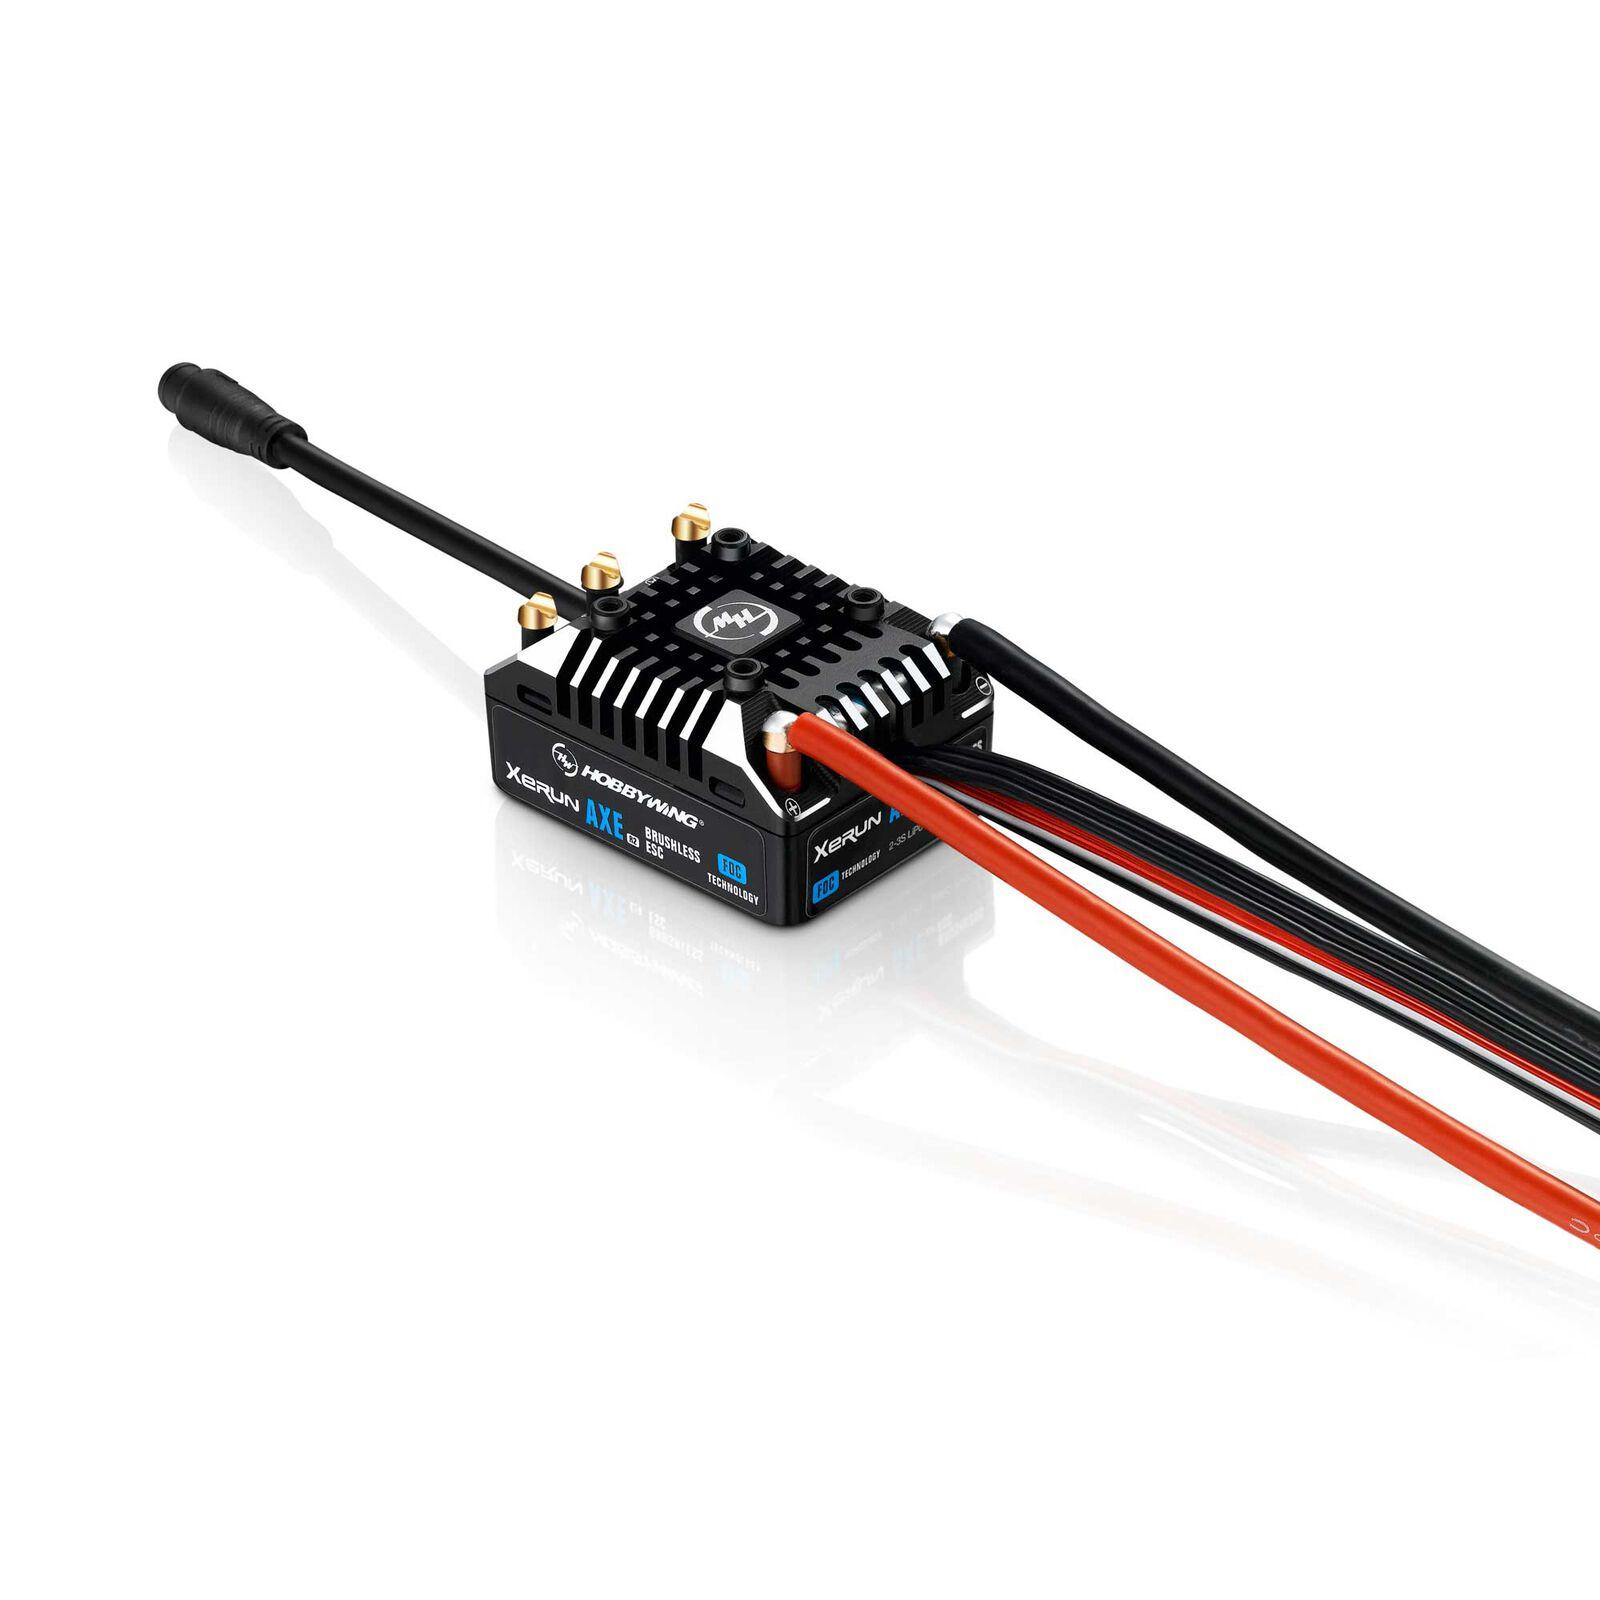 XERUN AXE 540L 2100Kv Rock Crawler Combo: R2-FOC